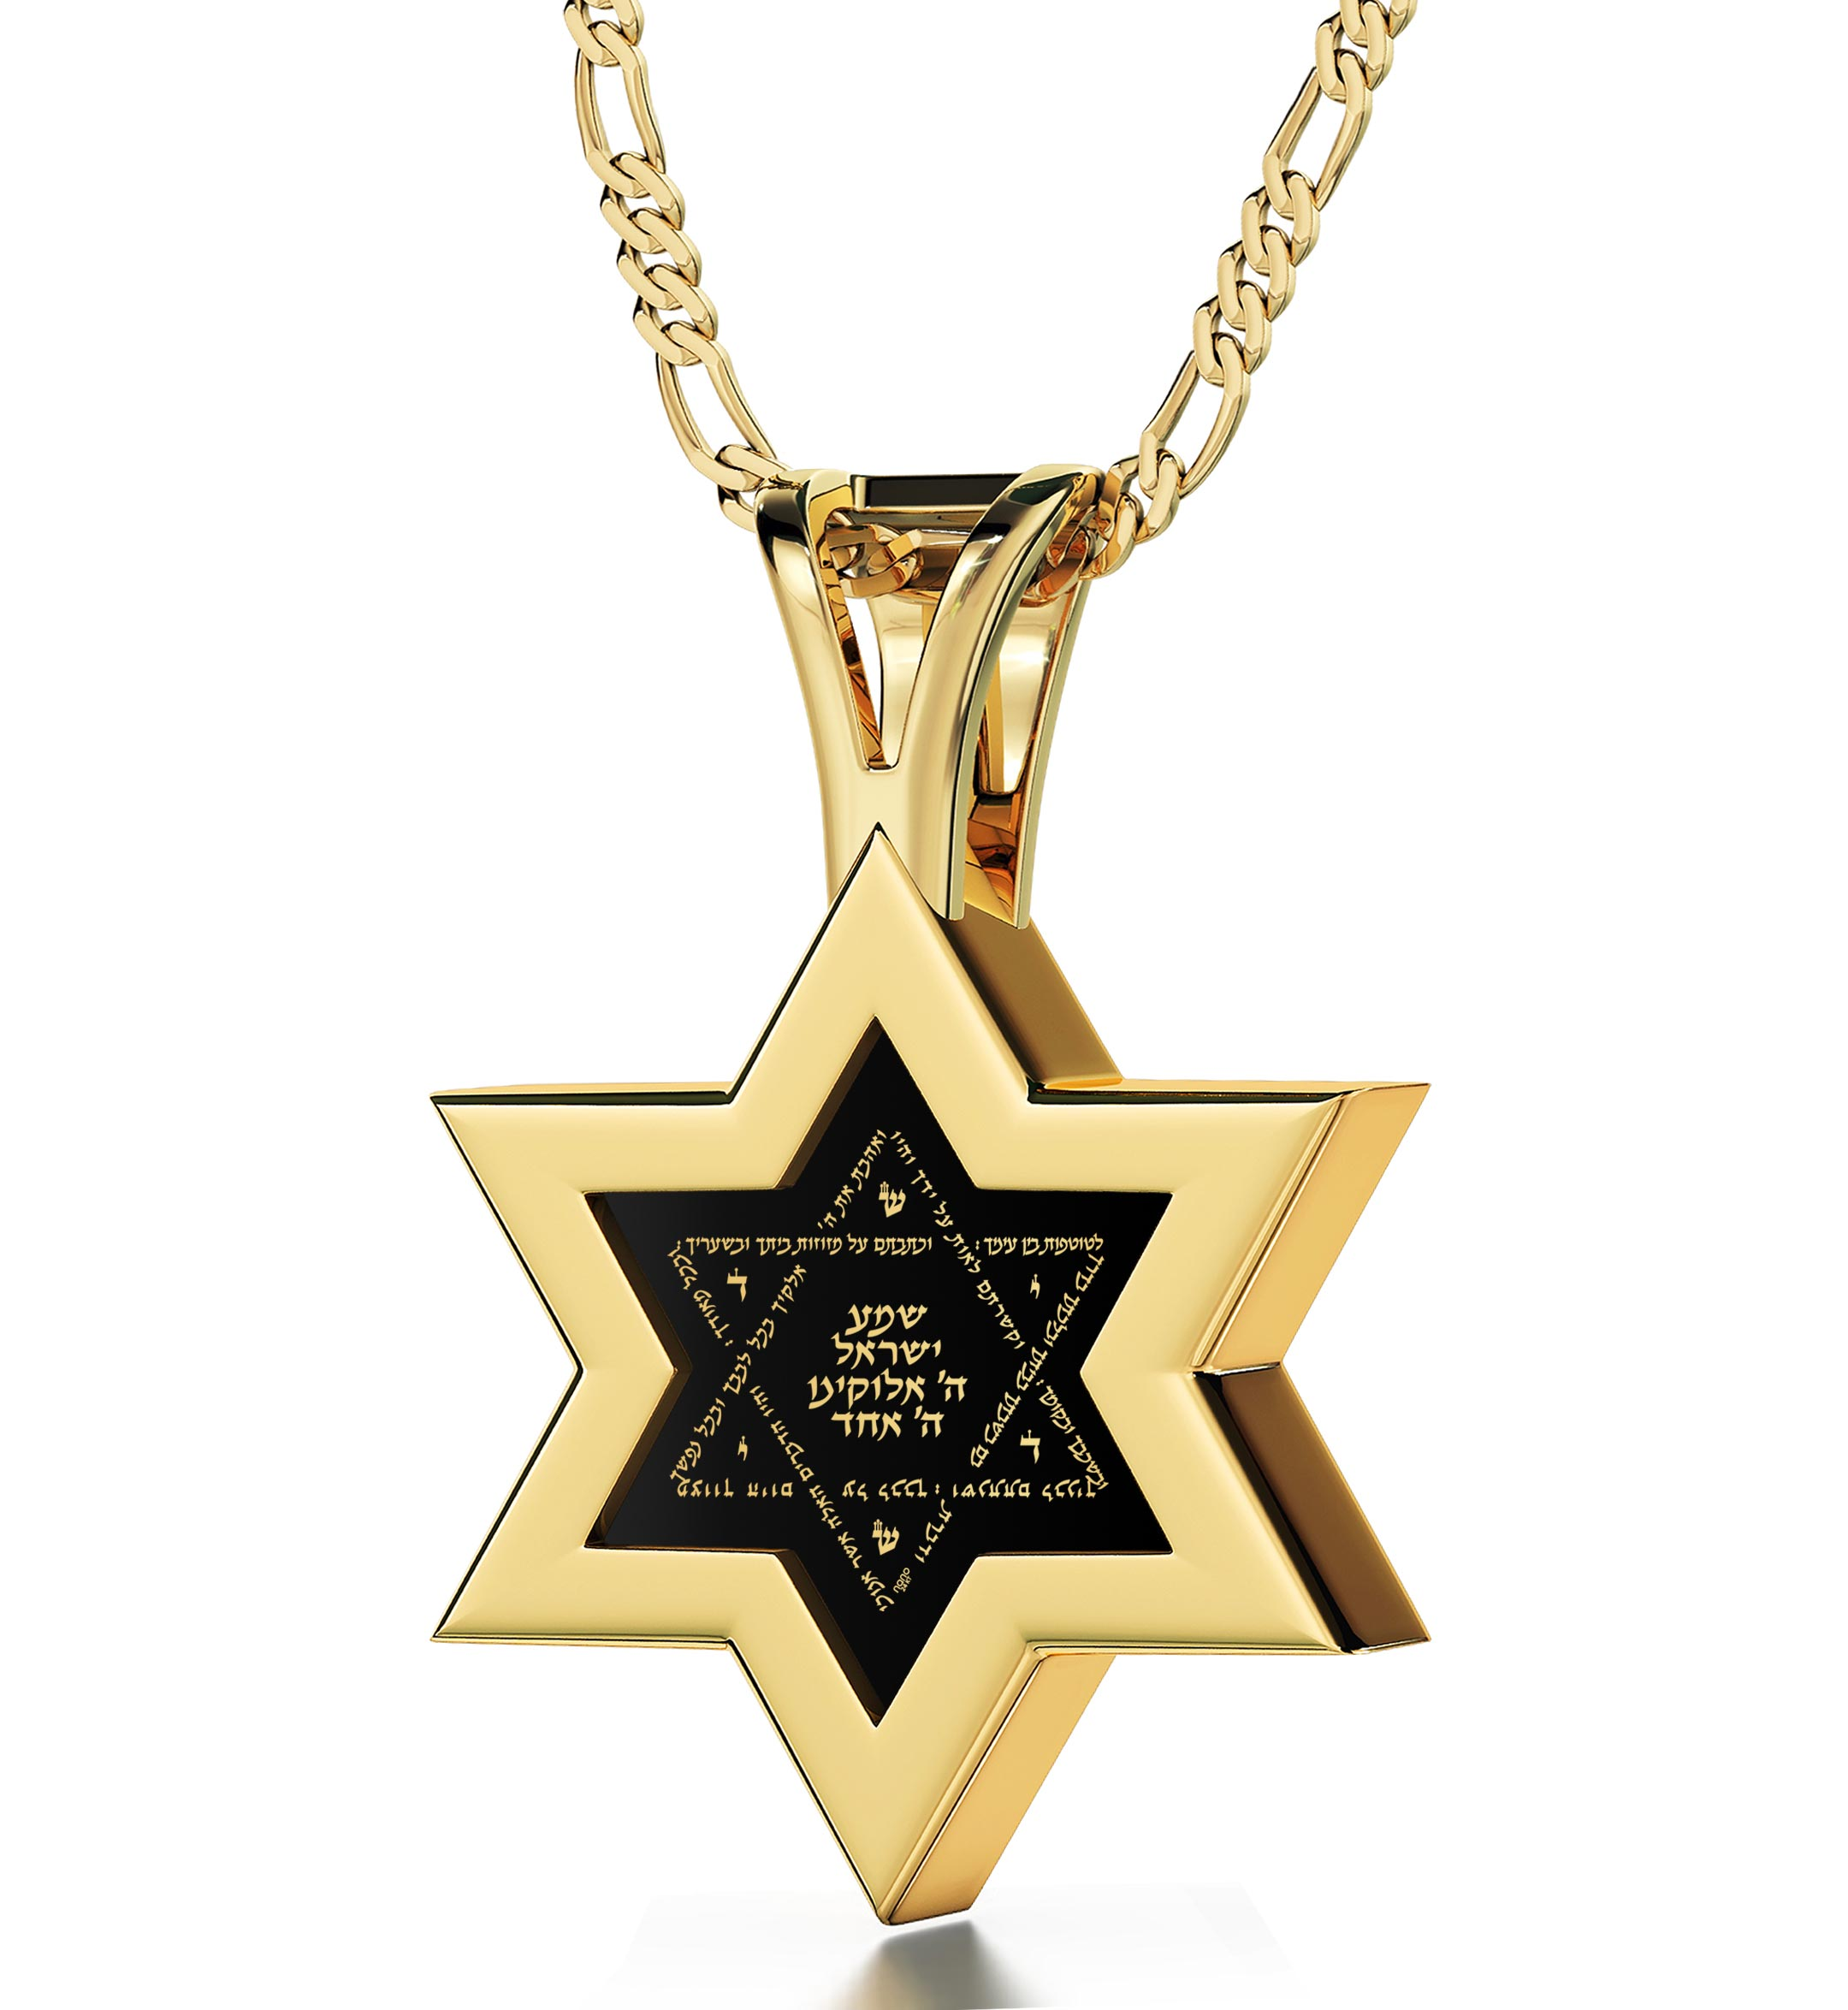 Shema israel bracelet israel bible jewish hebrew prayer kabbalah shma - 14k Yellow Gold Star Of David With Shema Yisrael Onyx